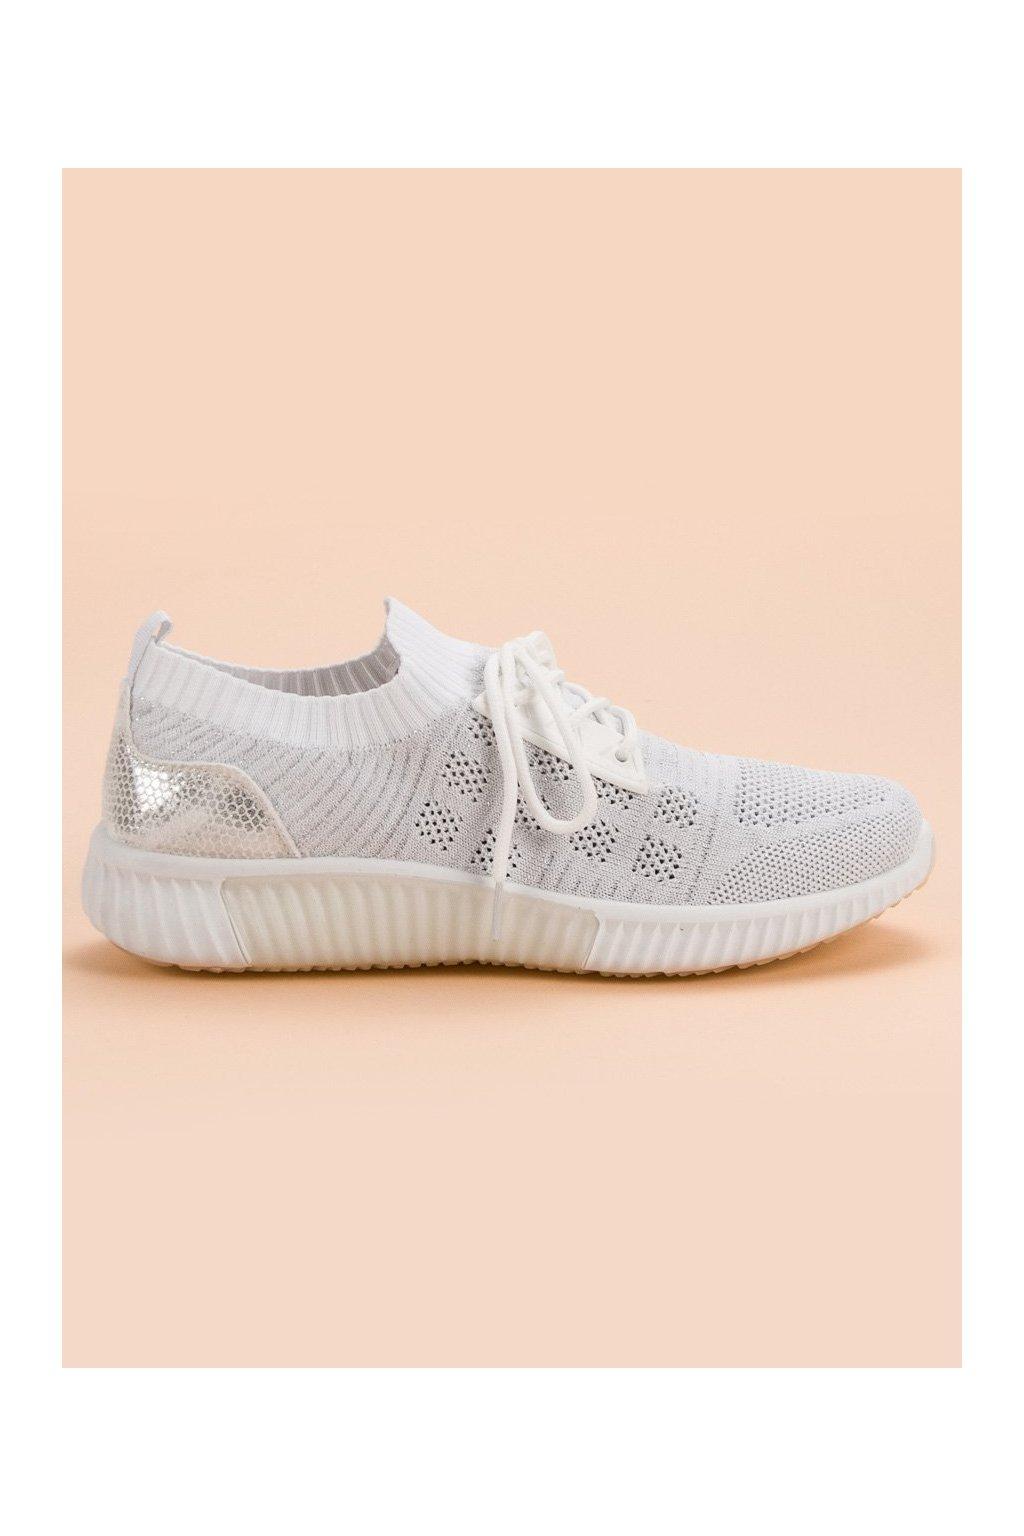 2bb40519c9 Biele tenisky sneakery s brokátom CnB